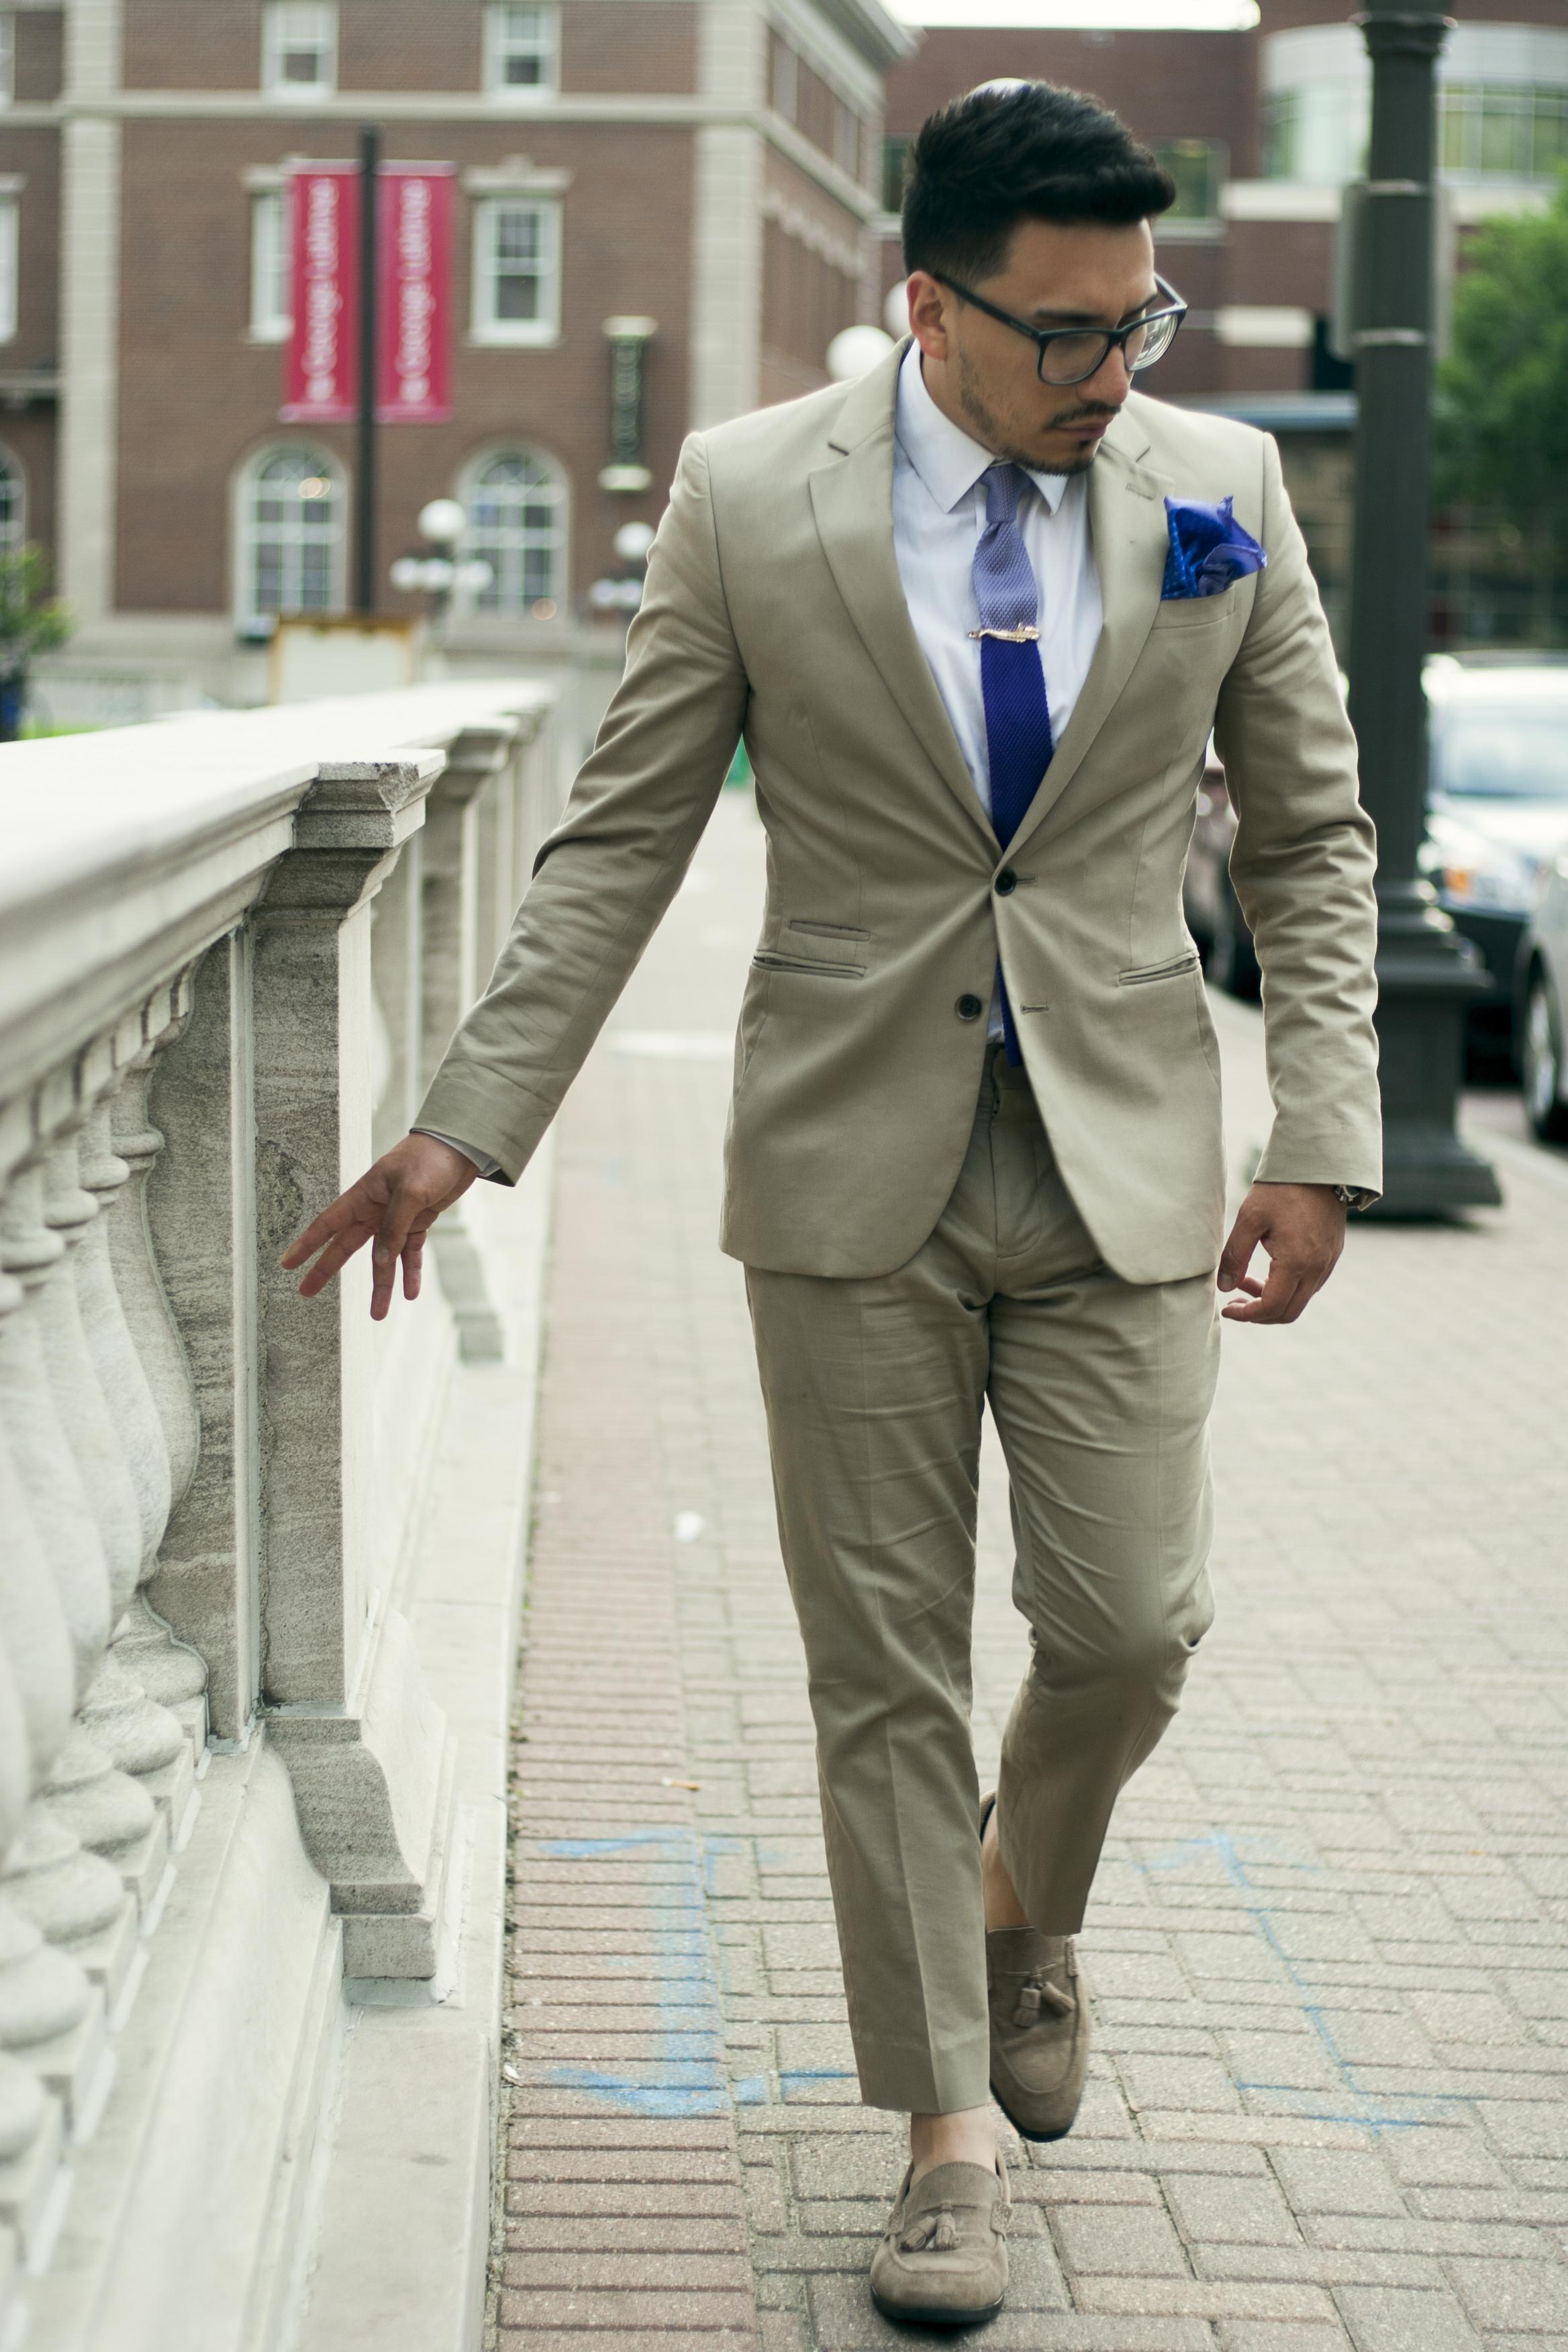 Khaki Suit for summer wedding